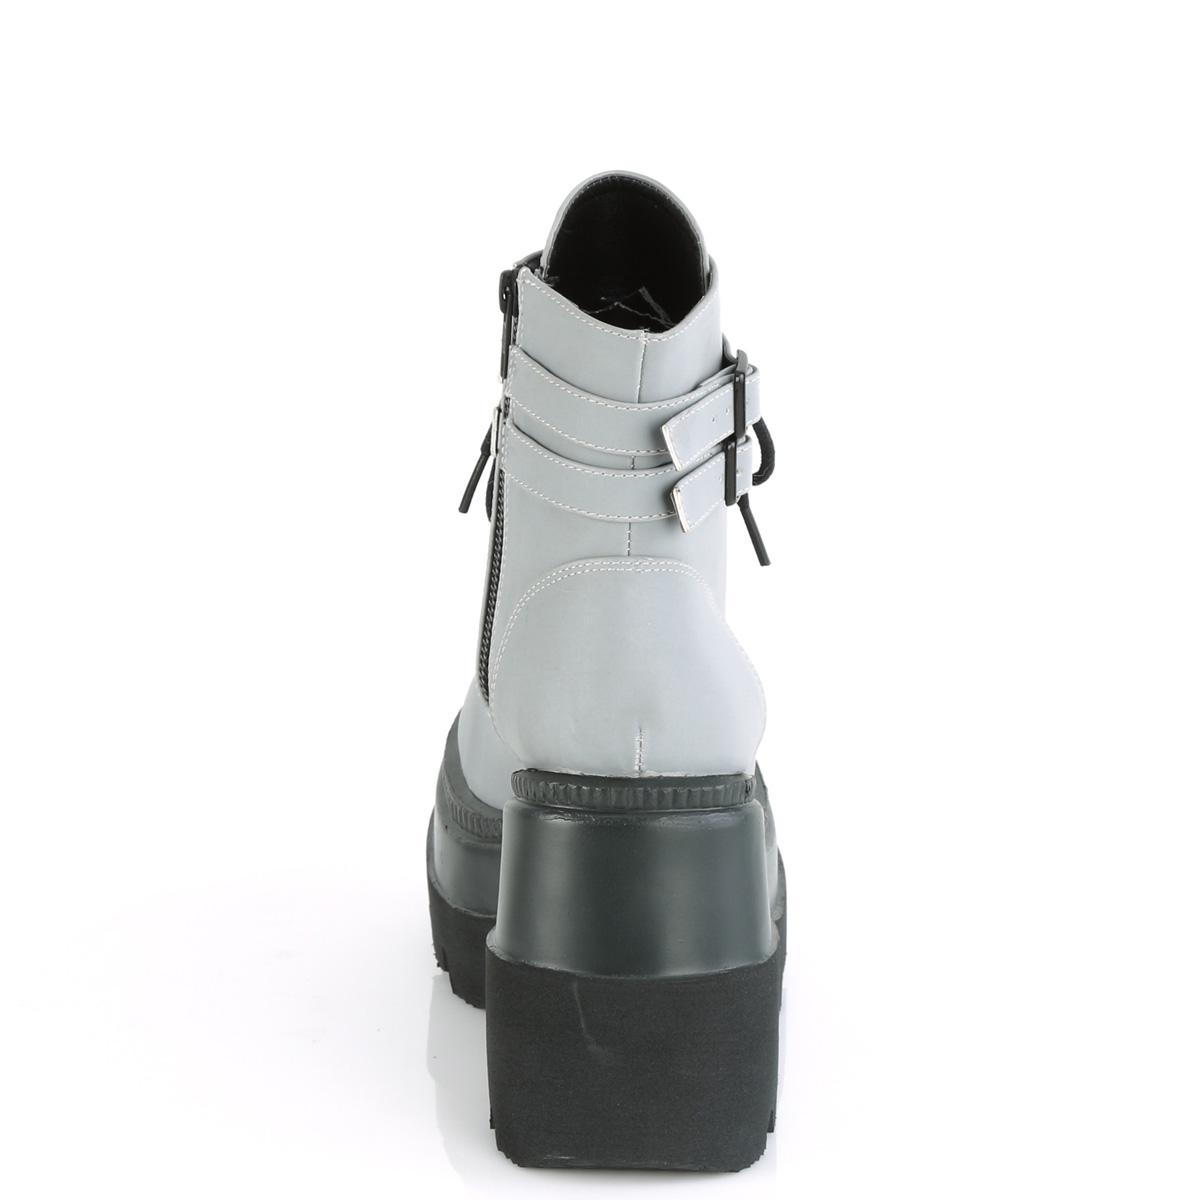 Demonia(デモニア) SHAKER-52 リフレクティブ素材 厚底ショートブーツアンクルブーツ サイドジップ グレー◆取り寄せ